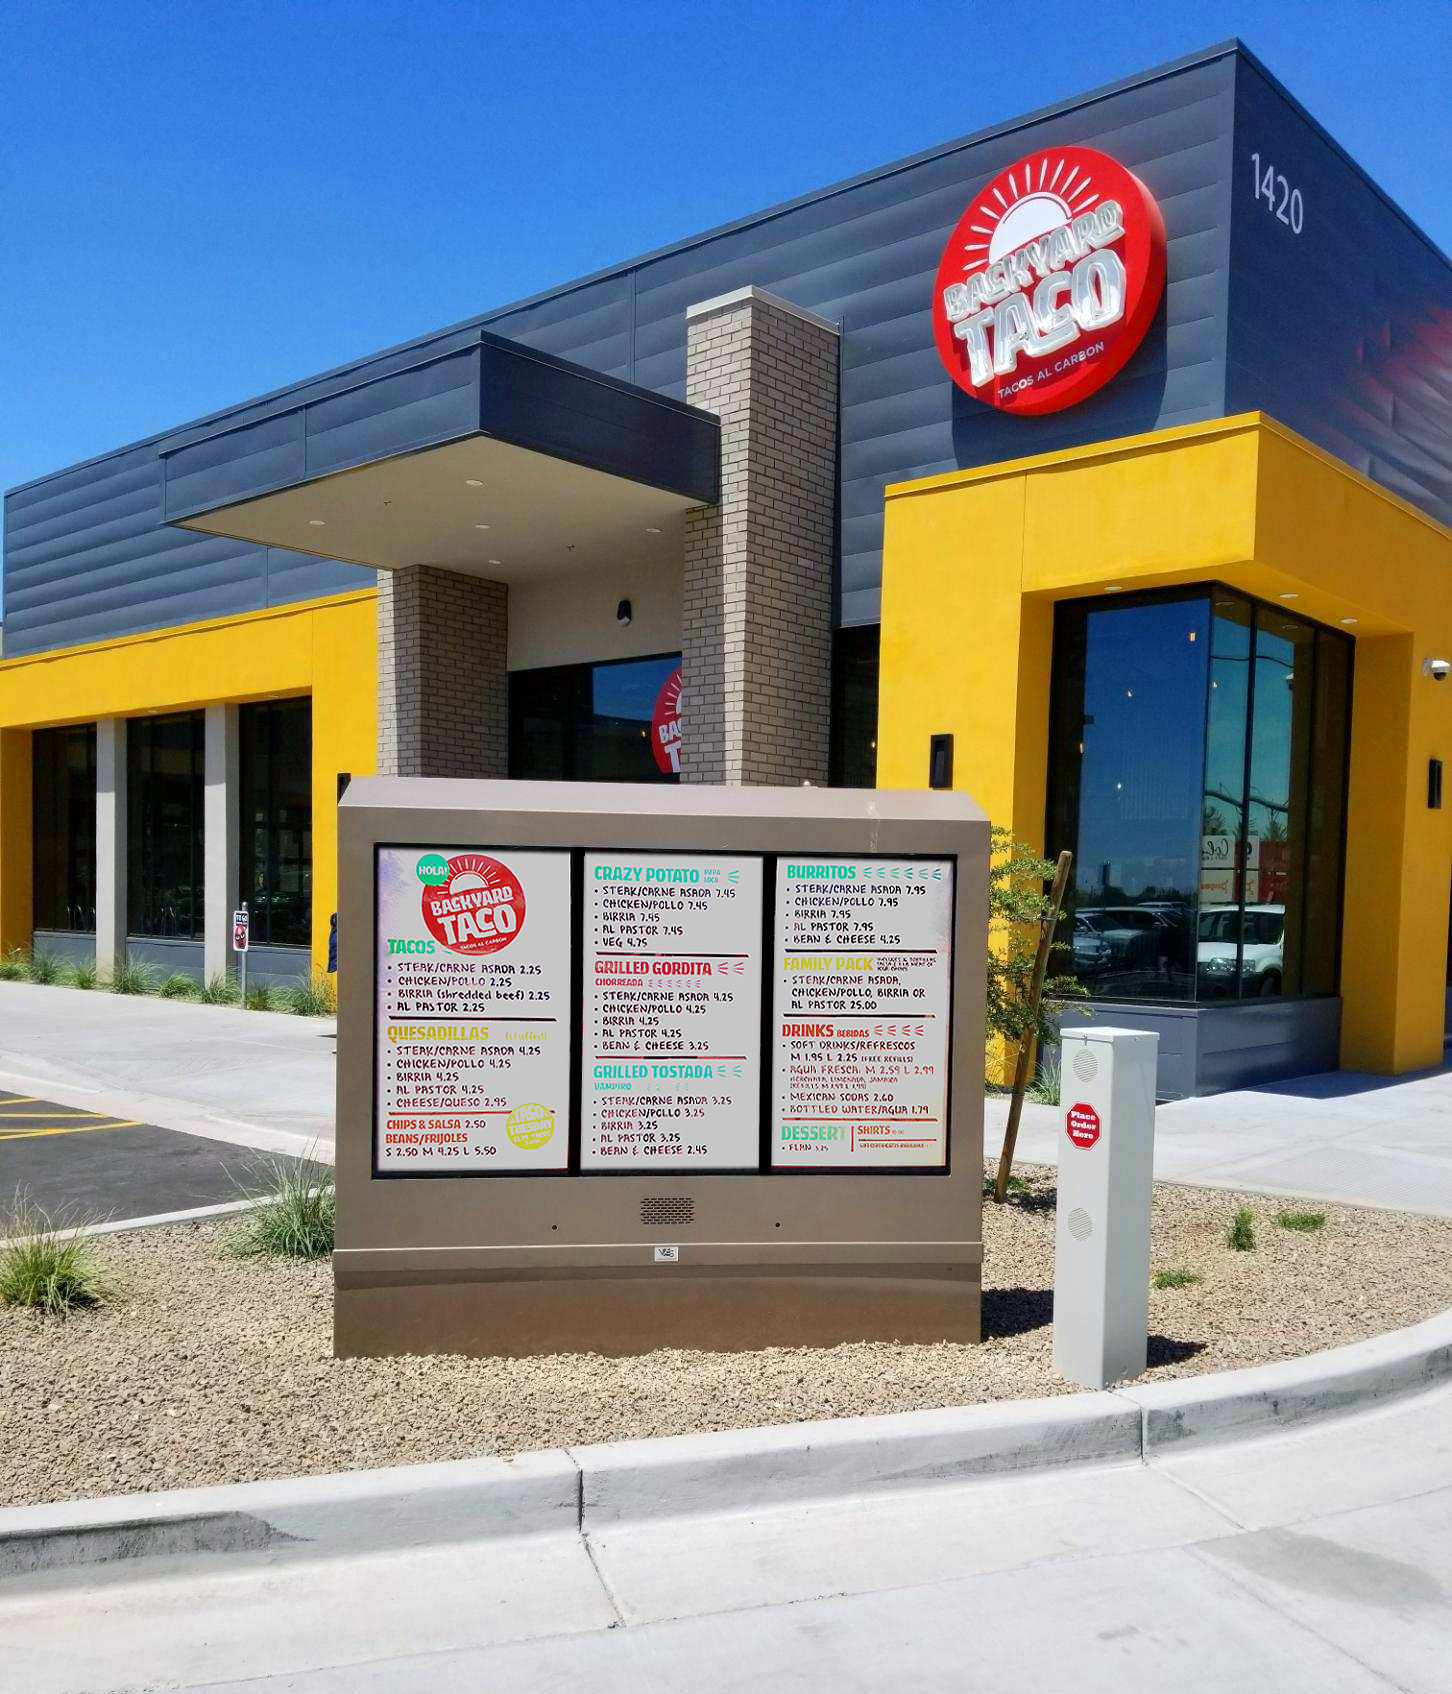 backyard-taco-3x1-outdoor-digital-menu-boards-viewstation-itsenclosures.jpg